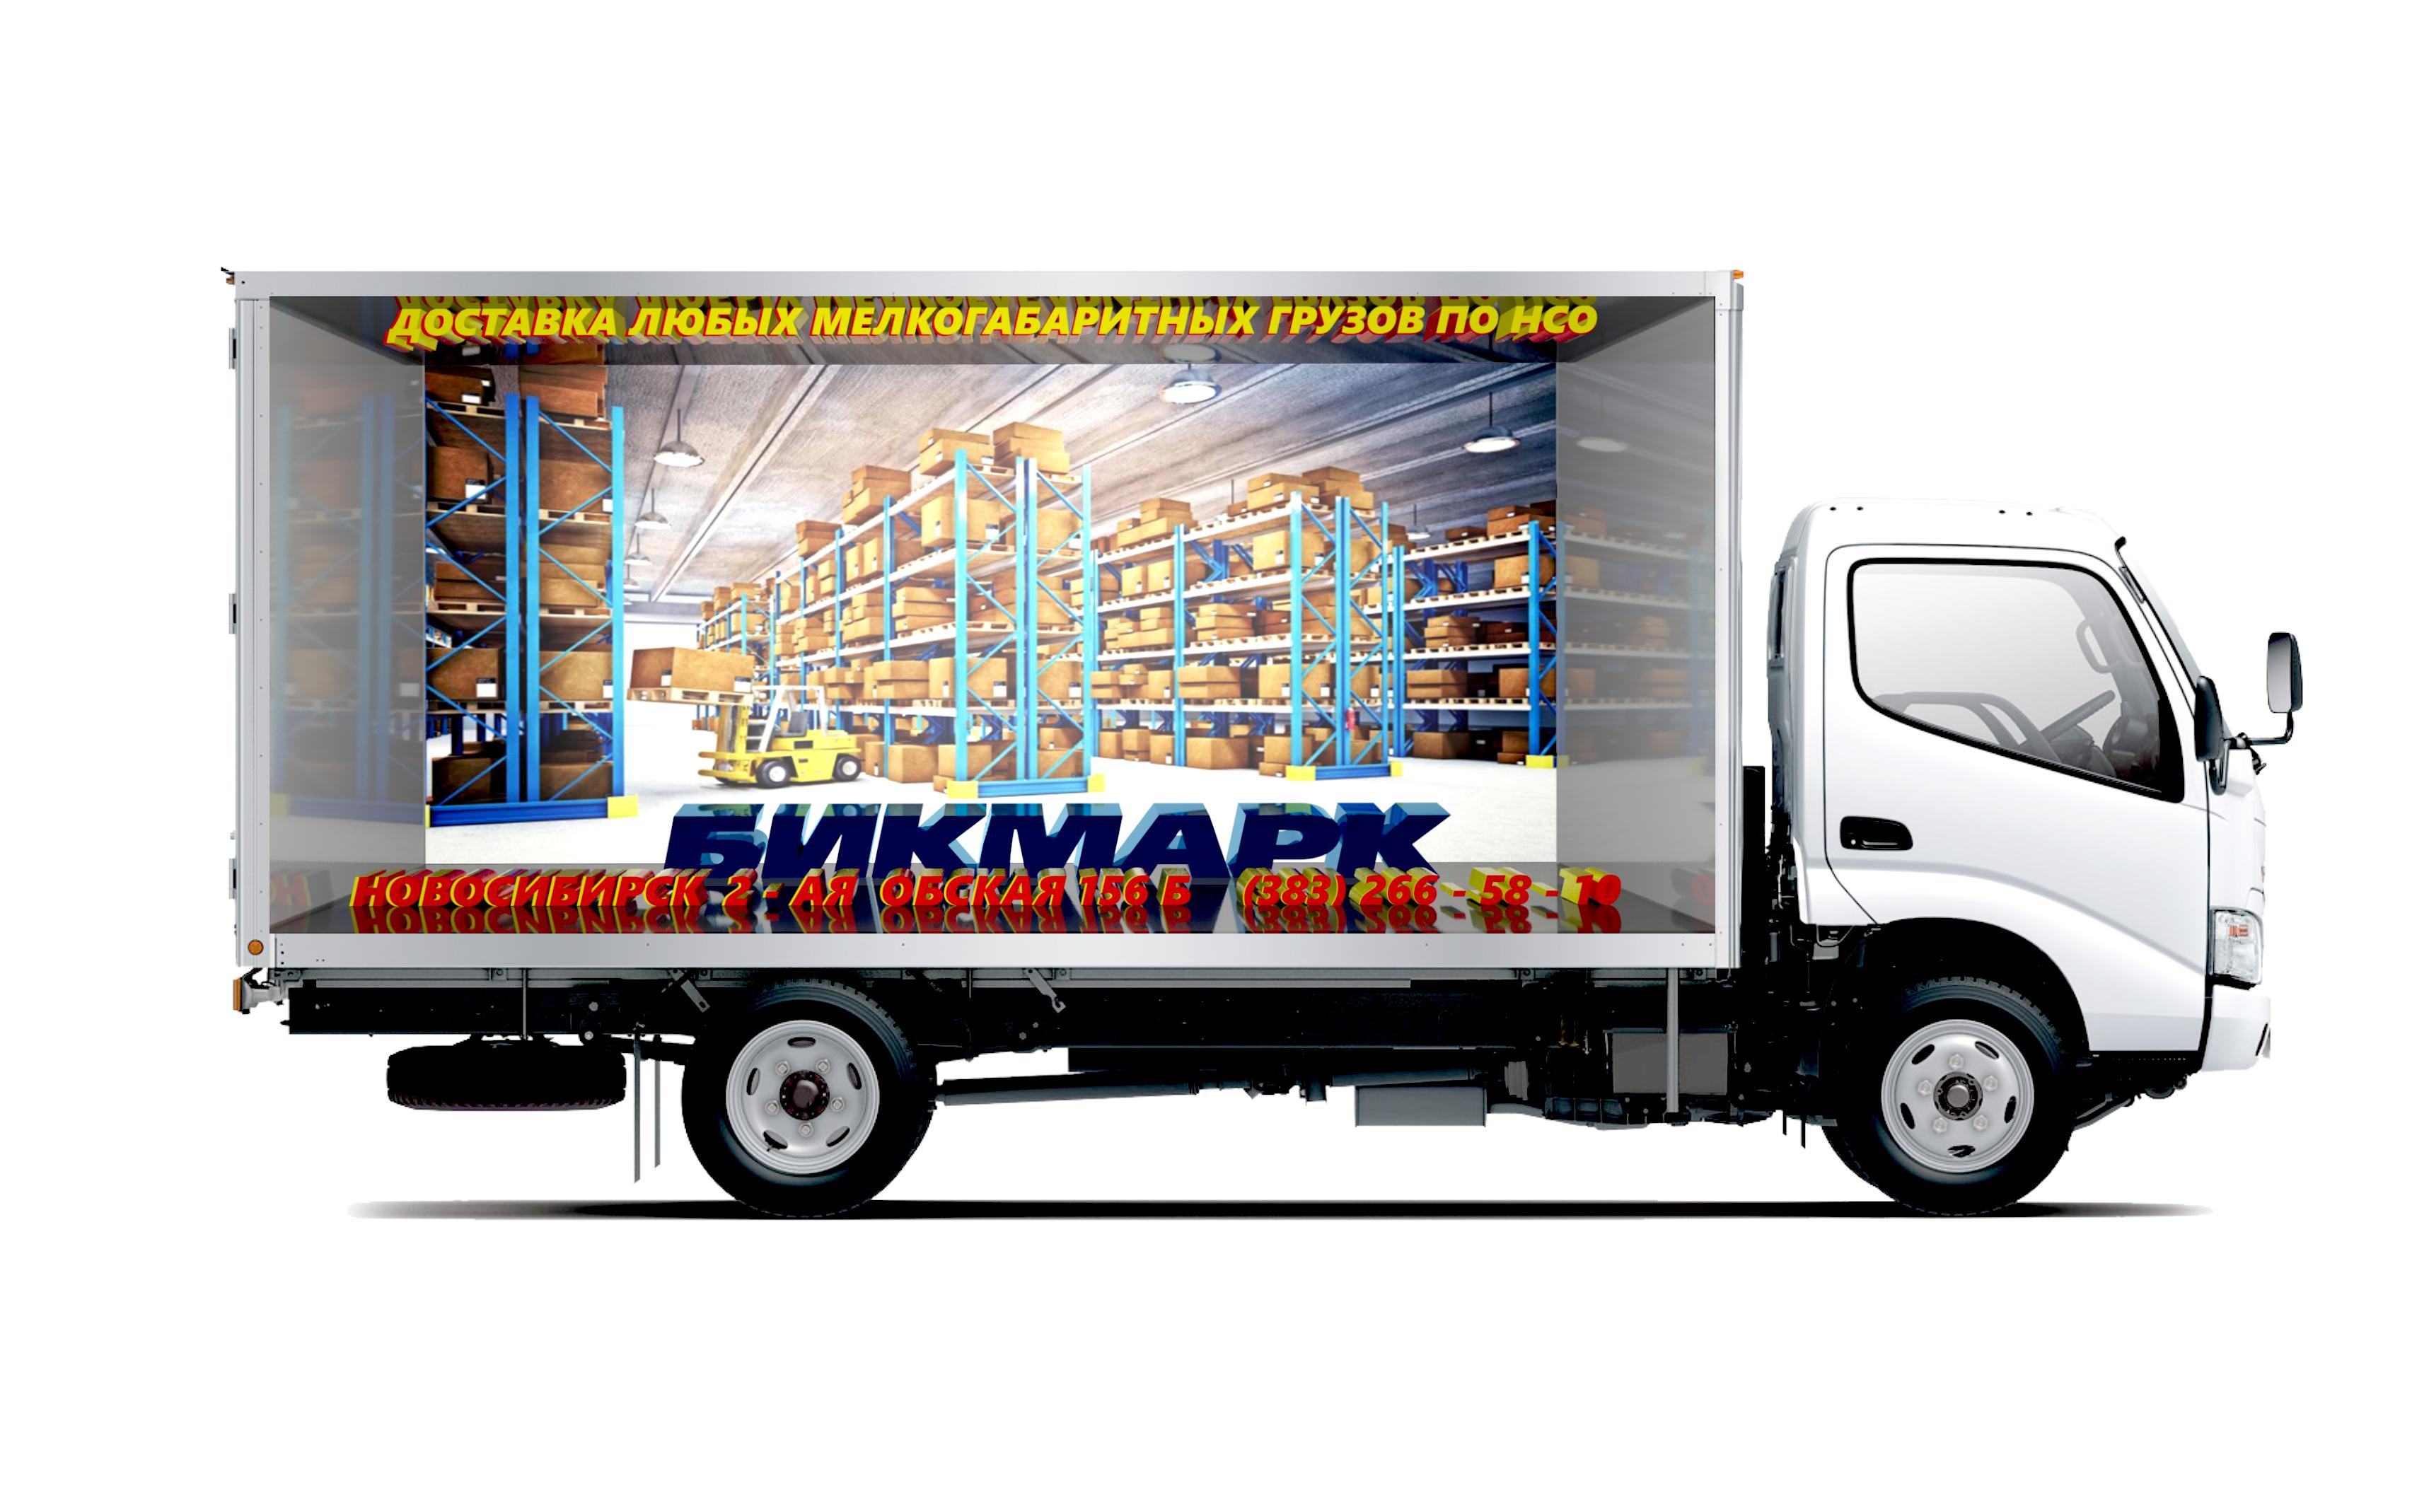 Разработка  рекламы на грузовые машины фото f_4345b2e9216870af.jpg